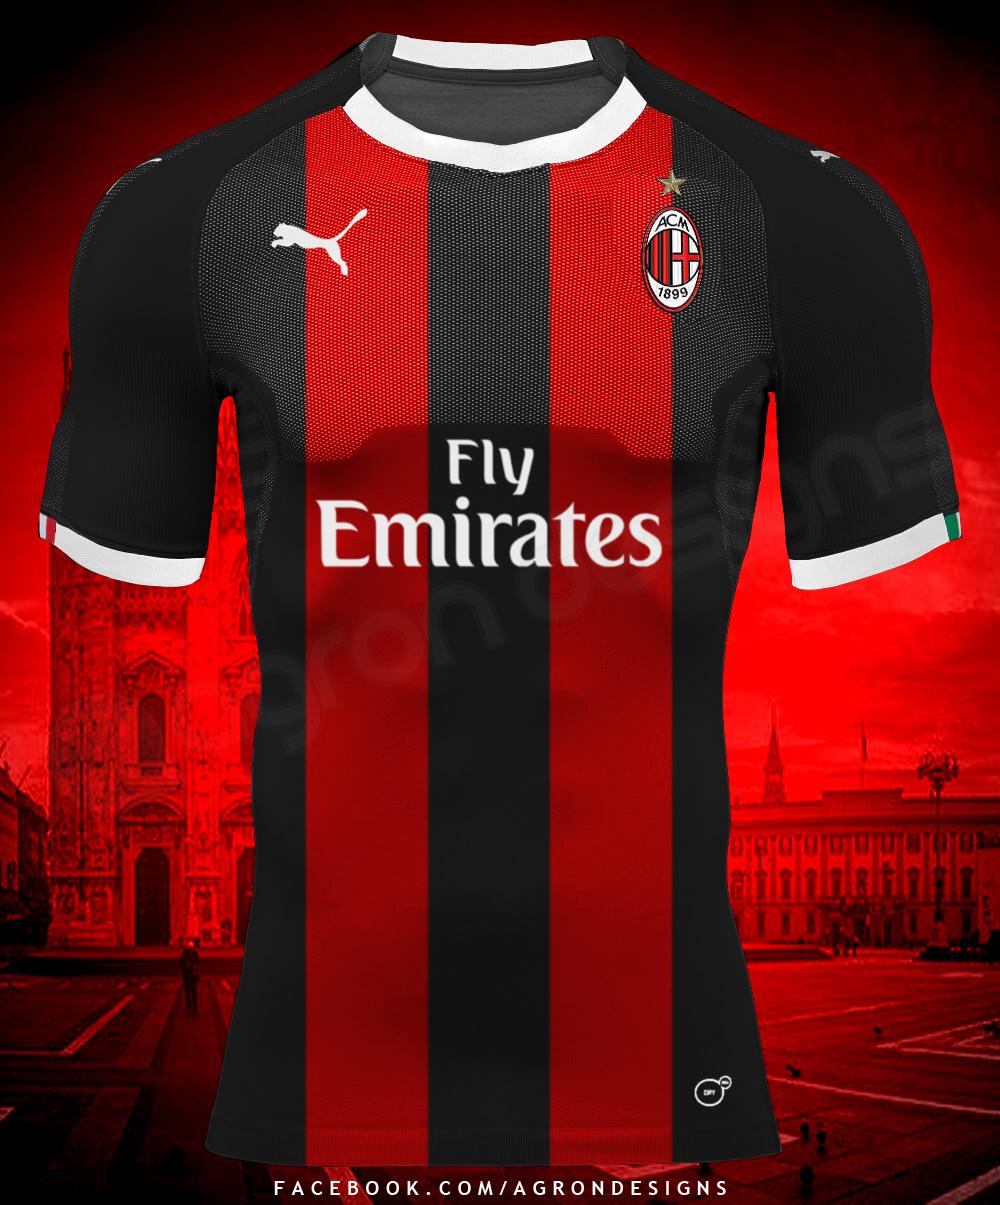 e5d54b5f9 Puma Ac Milan 2018-19 Home Kit Concept